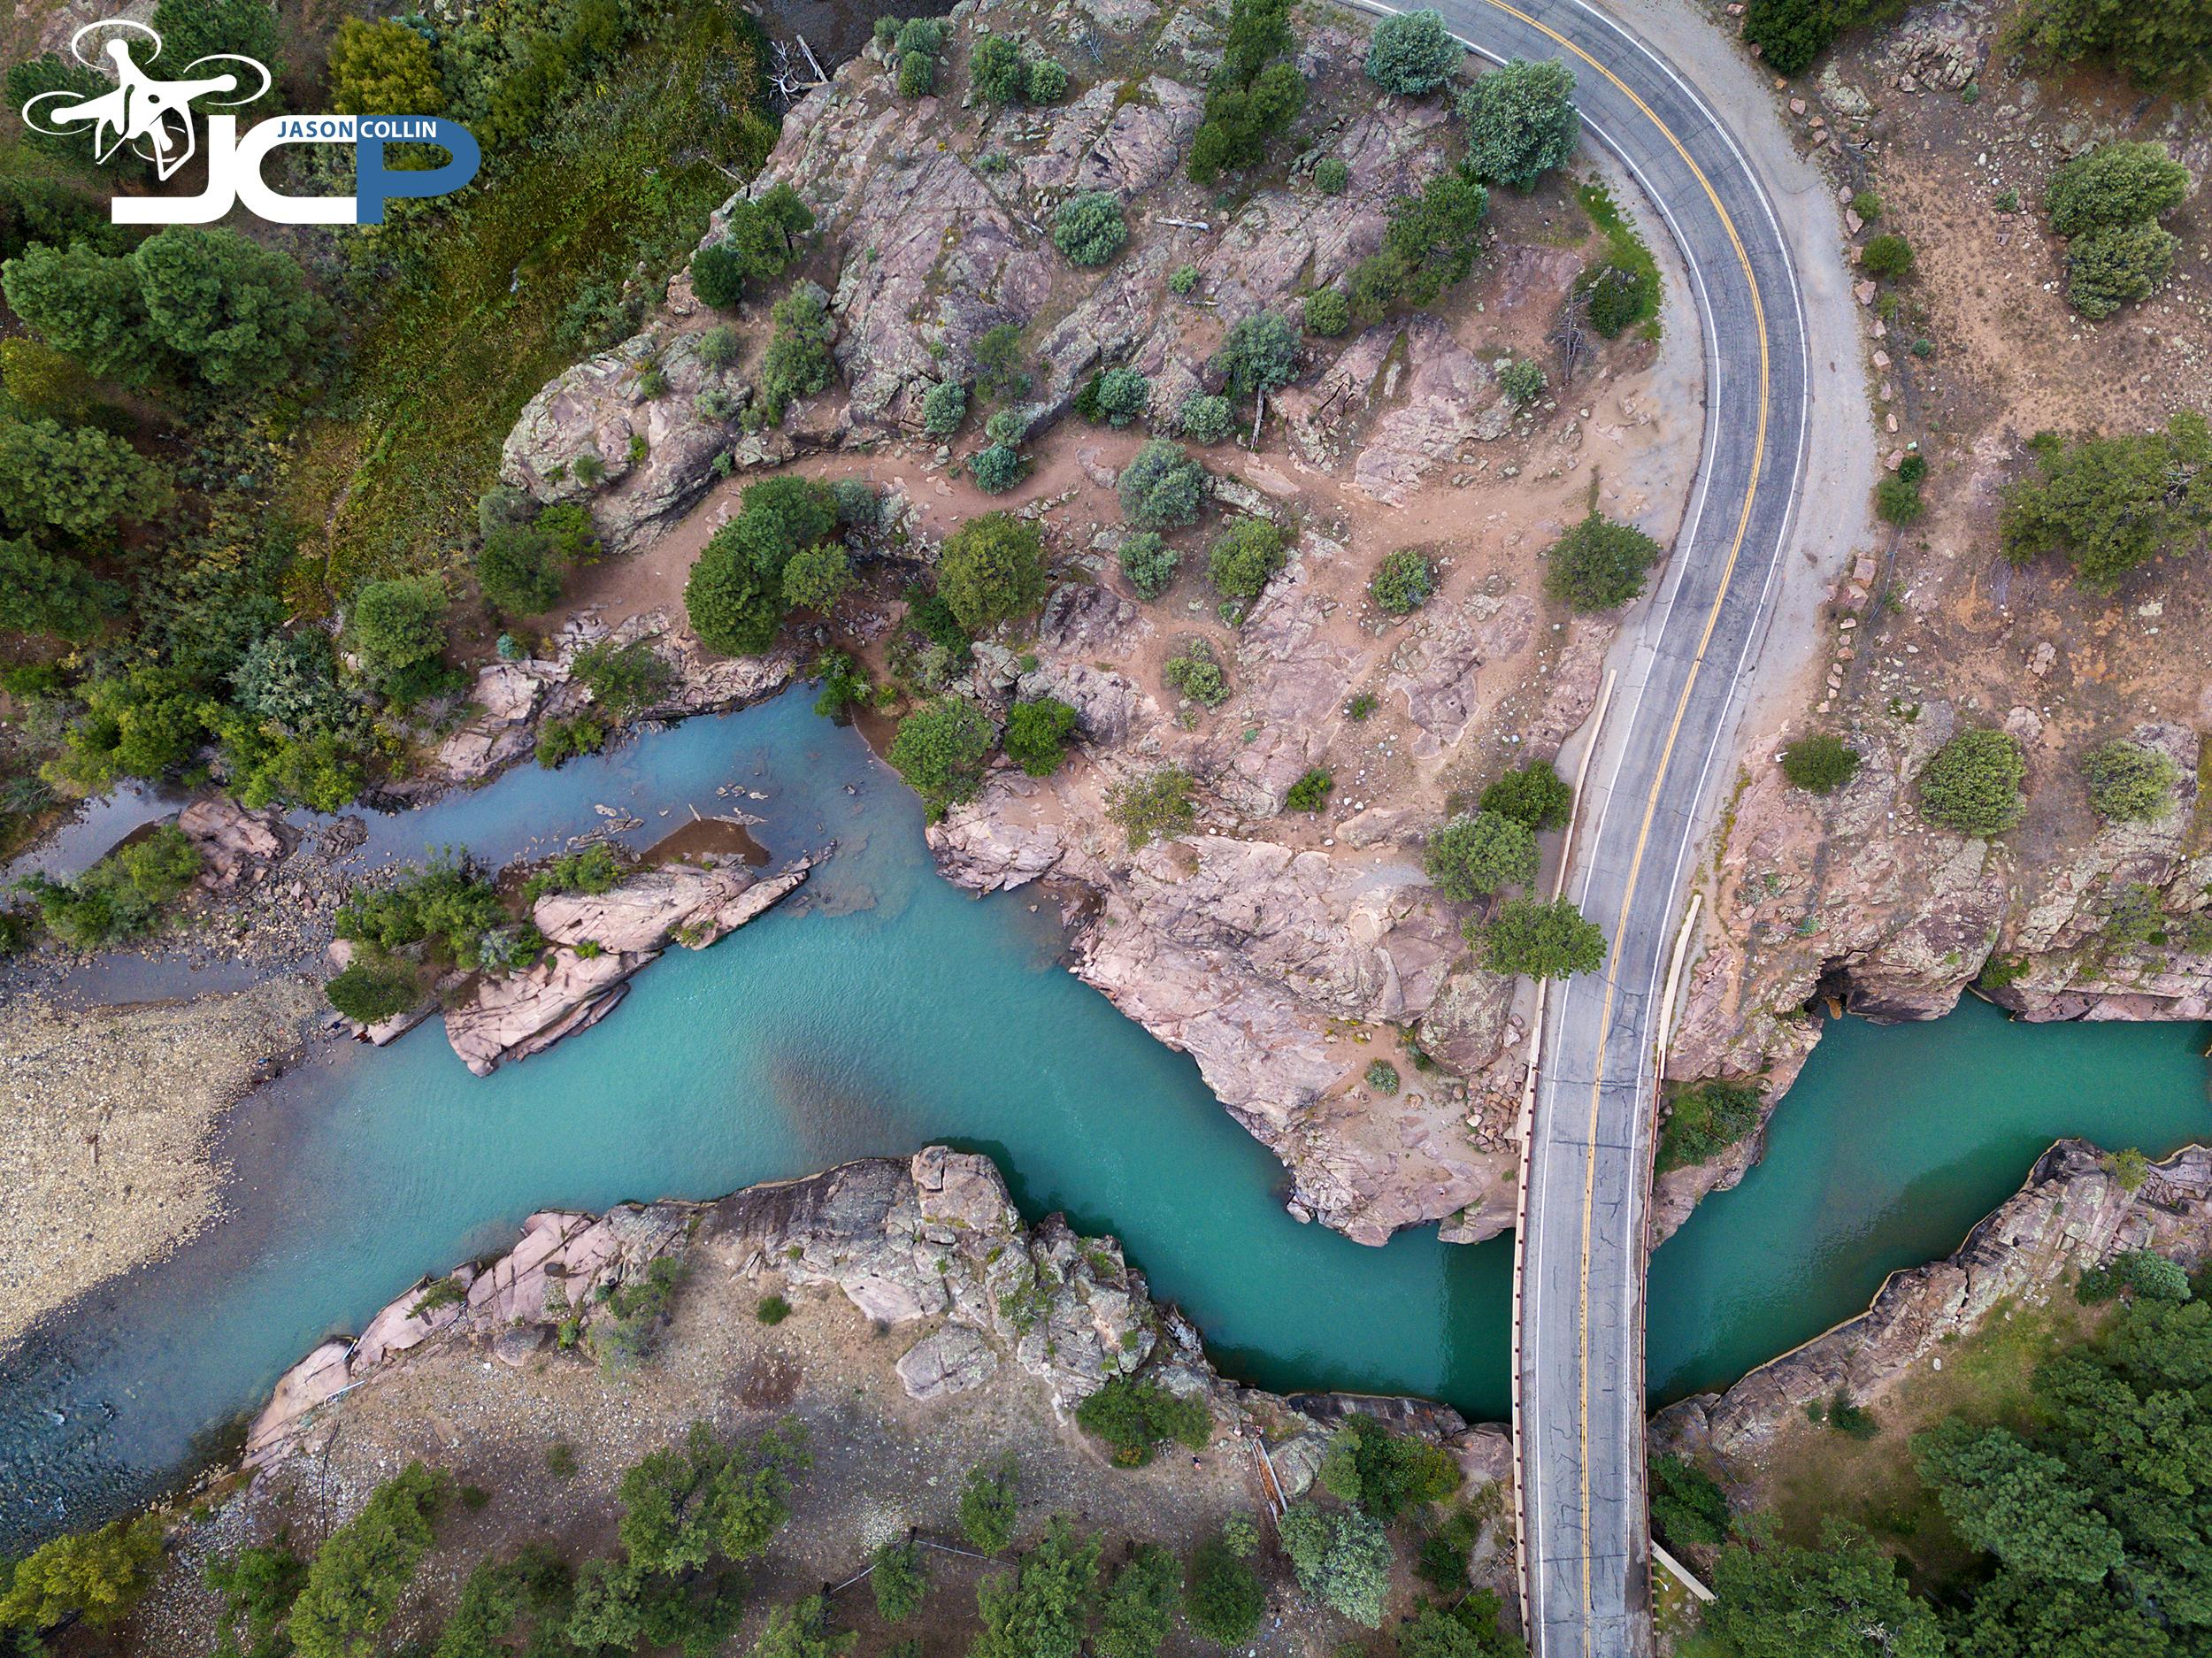 animas-river-9-02-2018-drone-102954.jpg